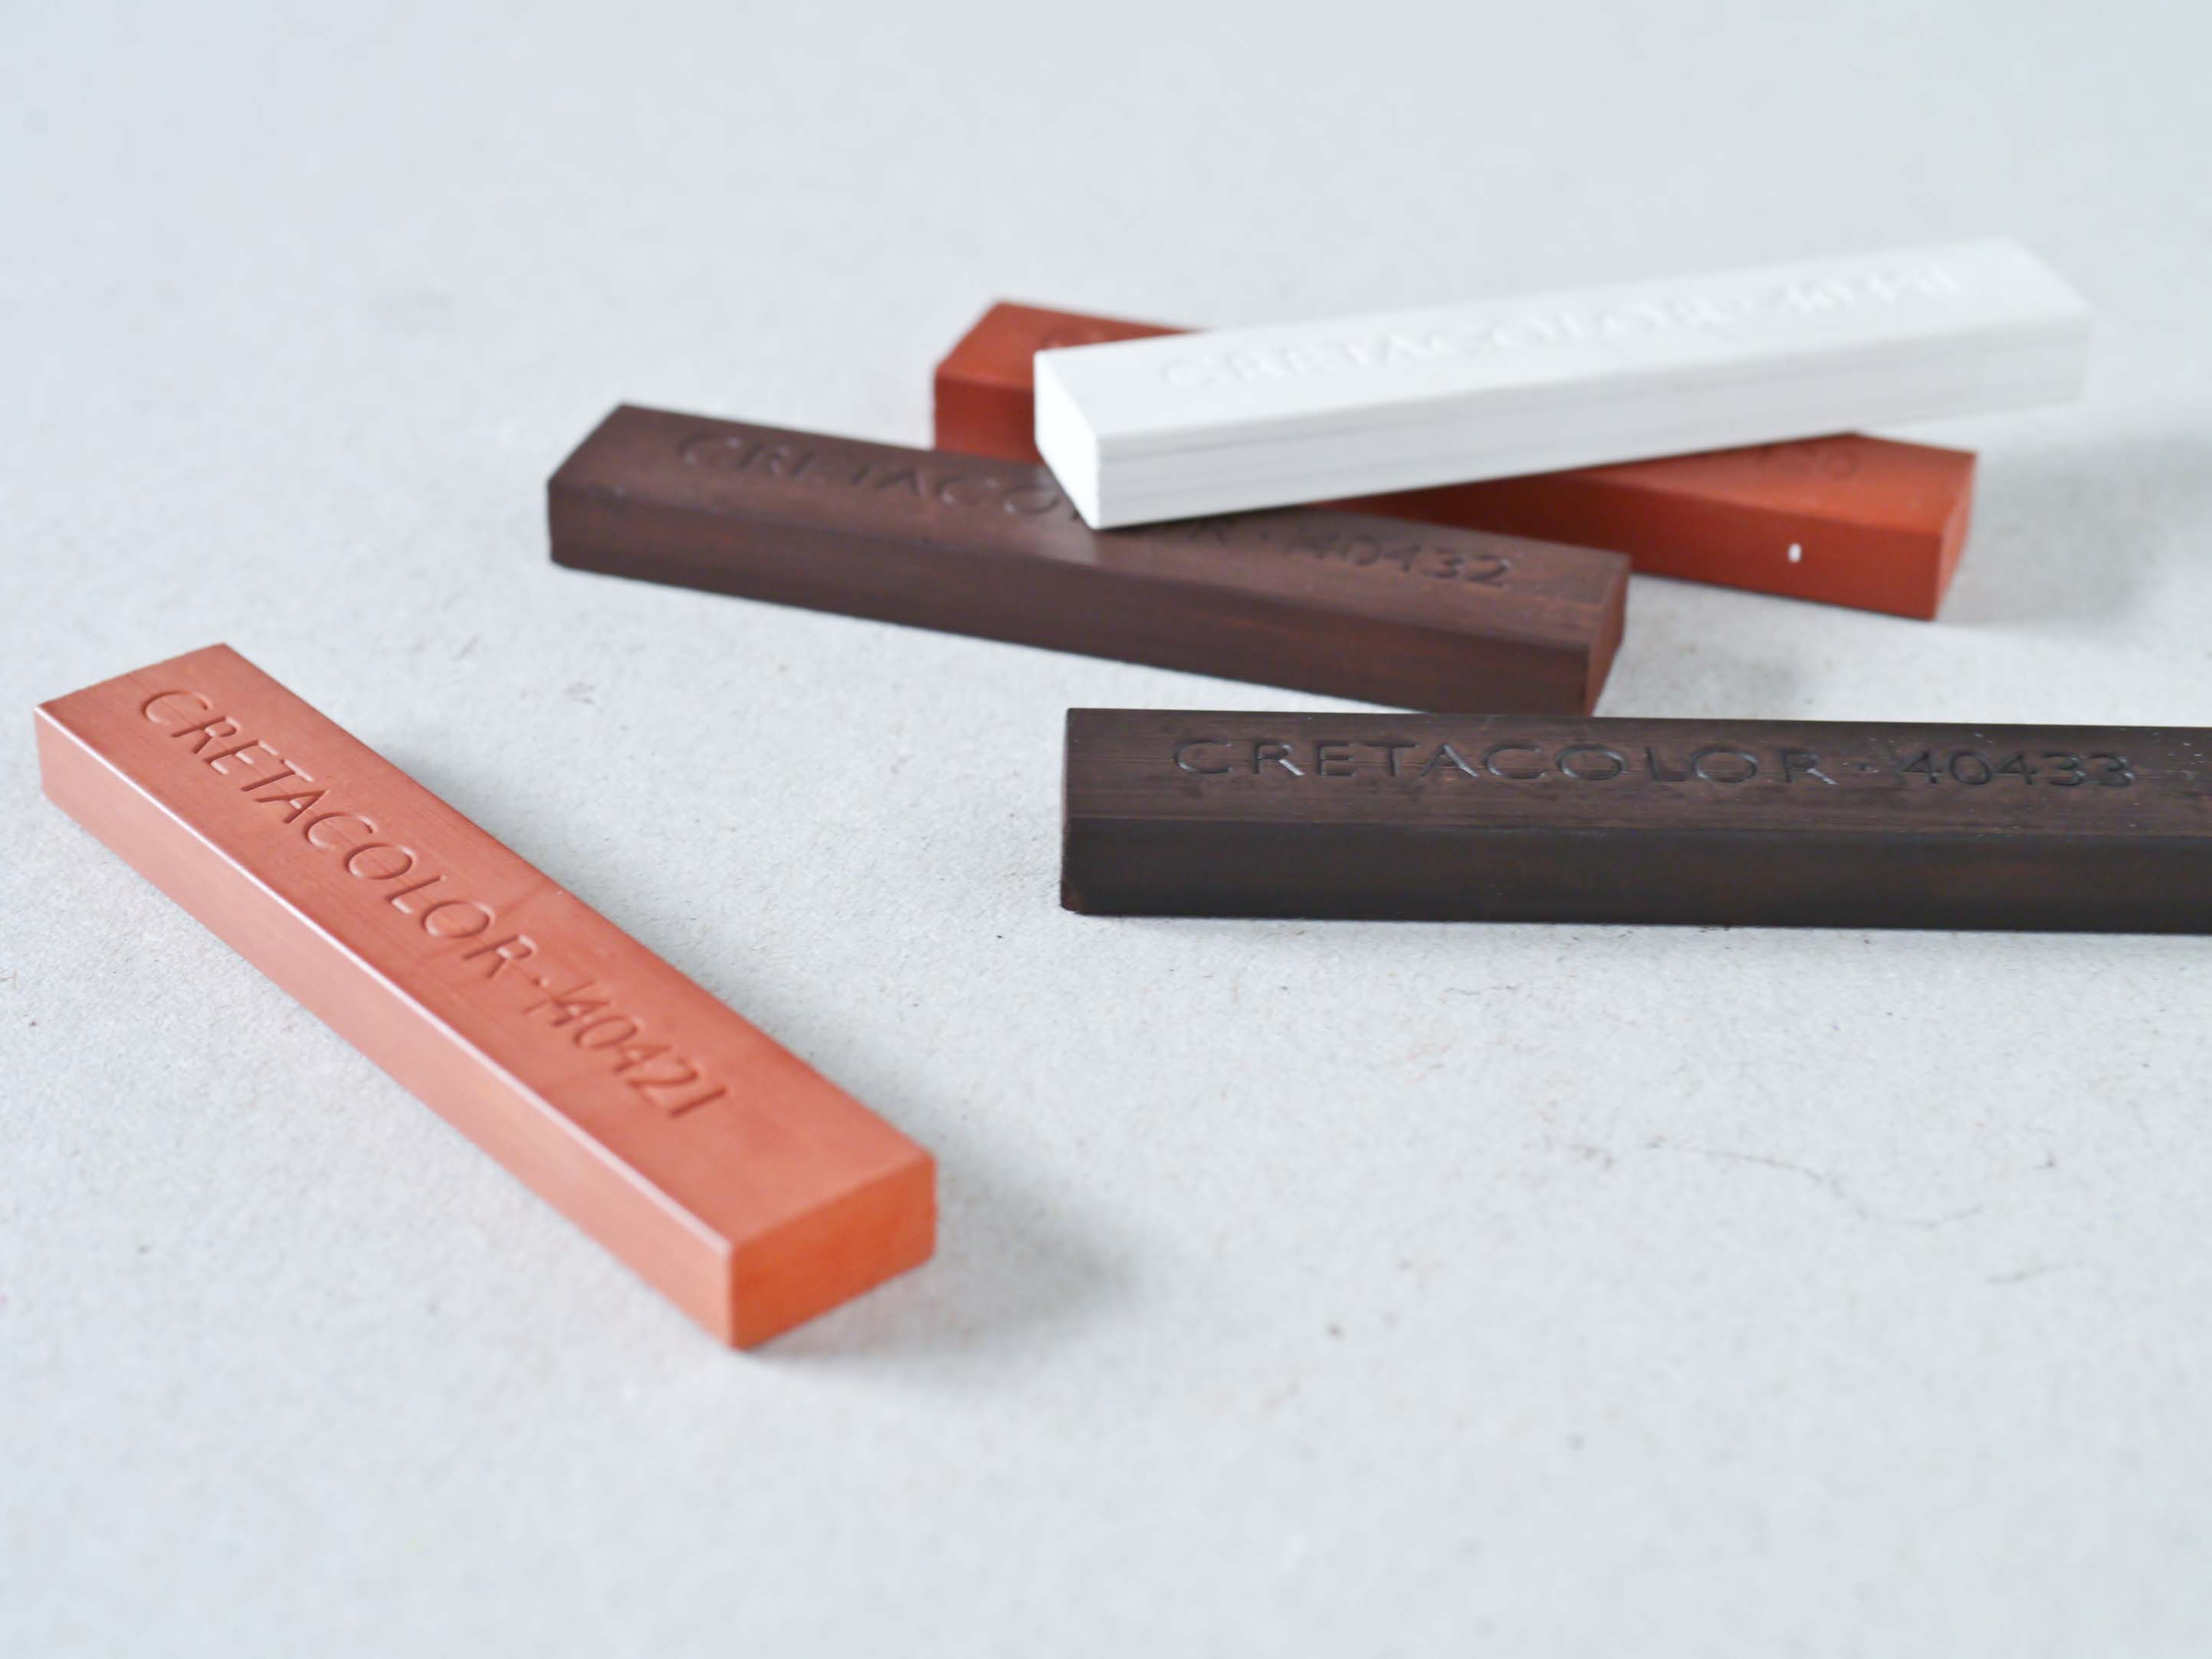 Cretacolor kridt sticks